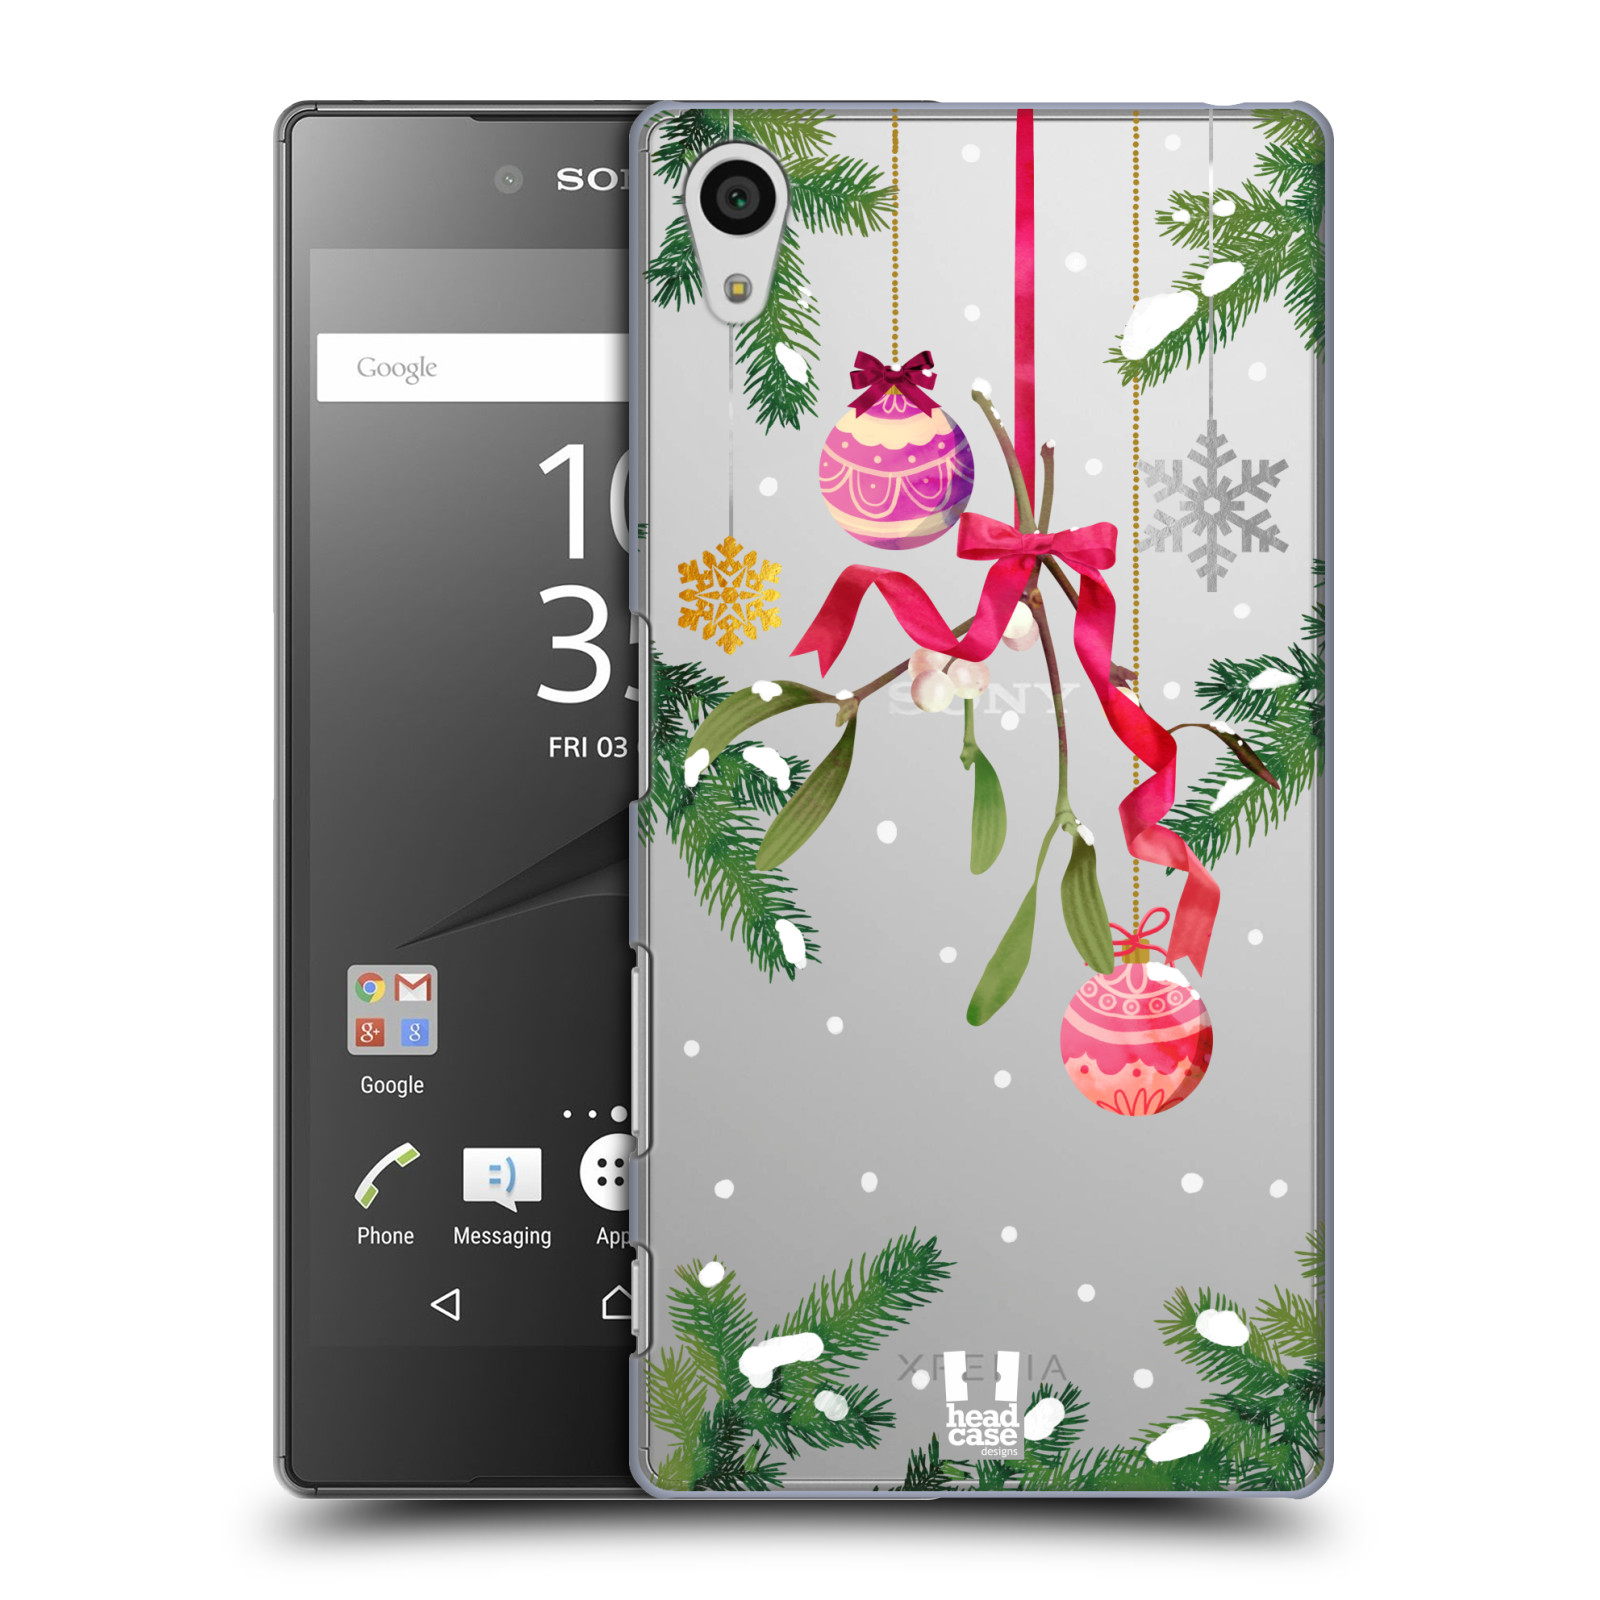 Plastové pouzdro na mobil Sony Xperia Z5 - Head Case - Větvičky a vánoční ozdoby